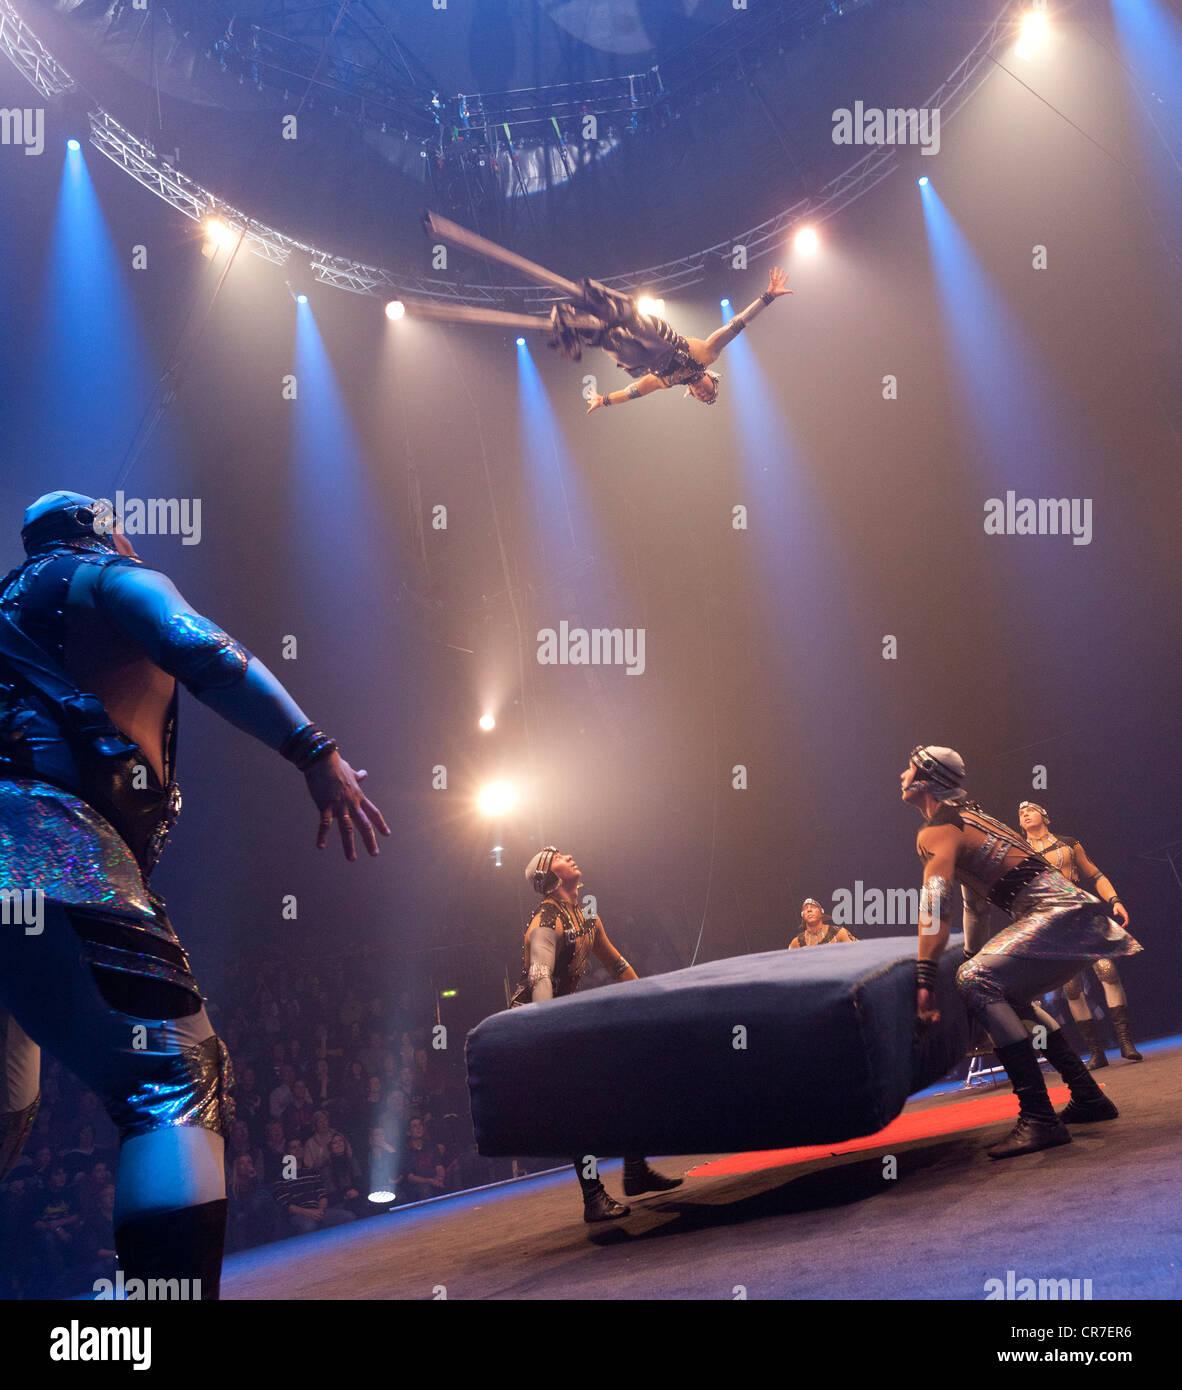 FlicFlac Dosov Troupe, Navidad, estreno de circo Schrille Nacht, eilige Nacht, Westfalia Hall, Dortmund Imagen De Stock